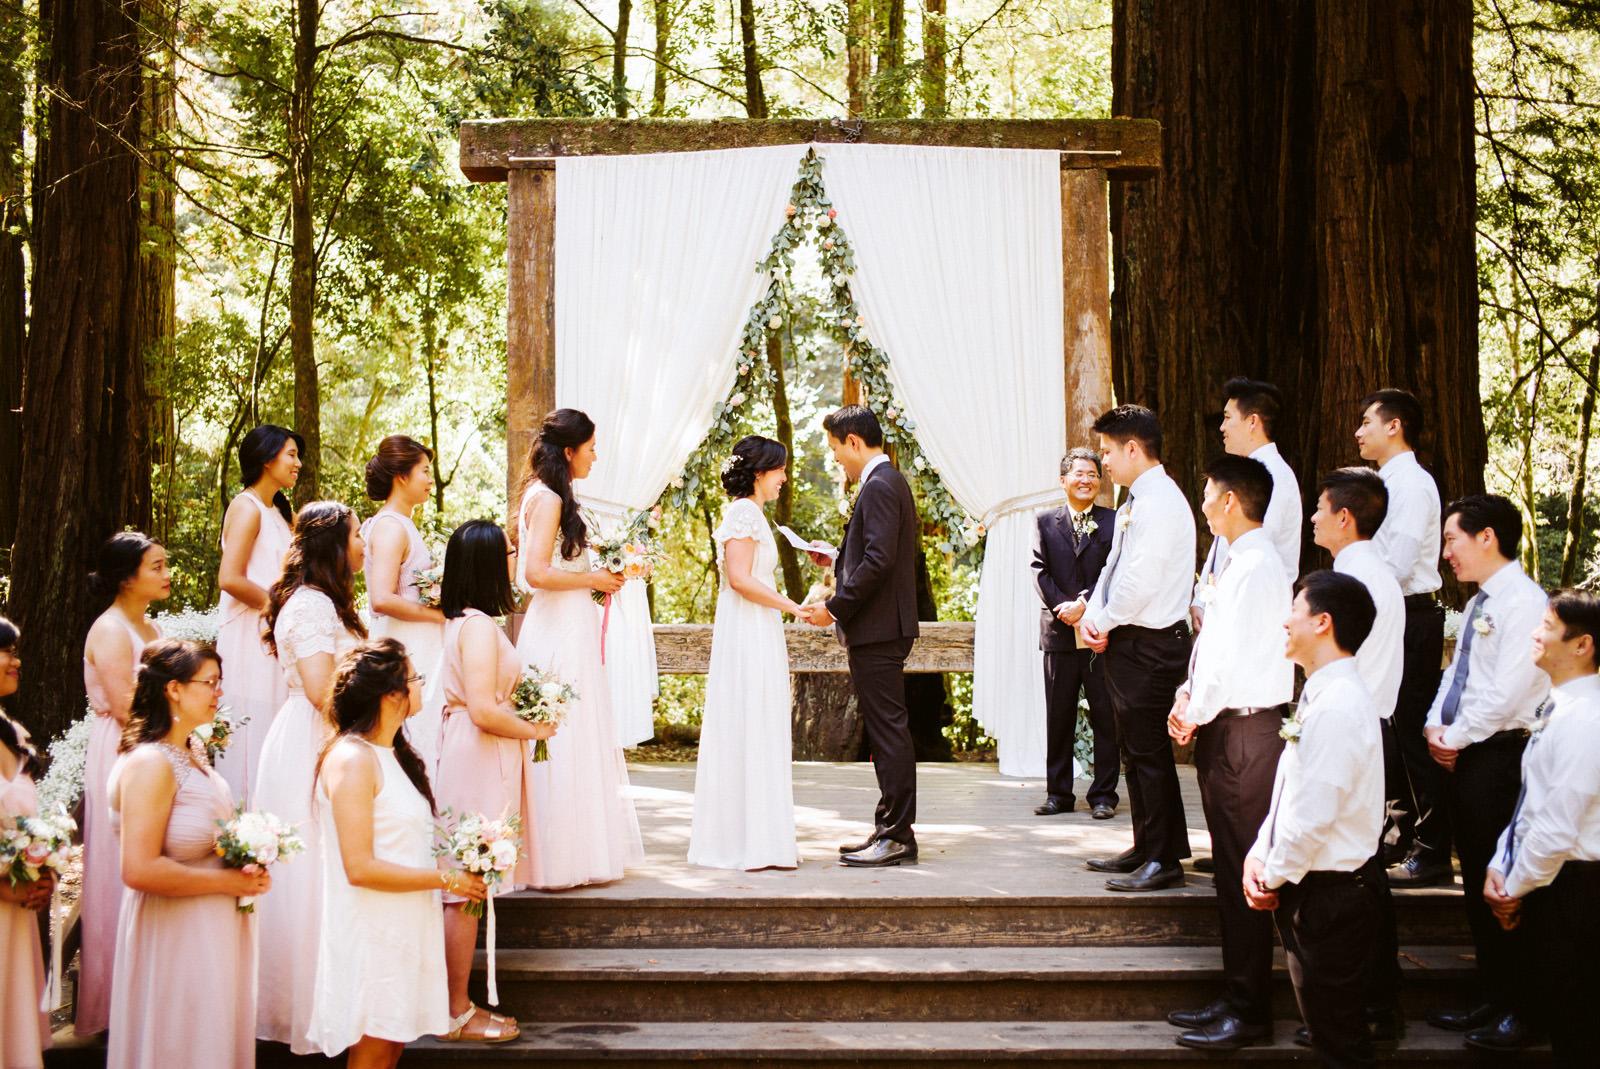 kimclay-blog-038 REDWOOD FOREST WEDDING